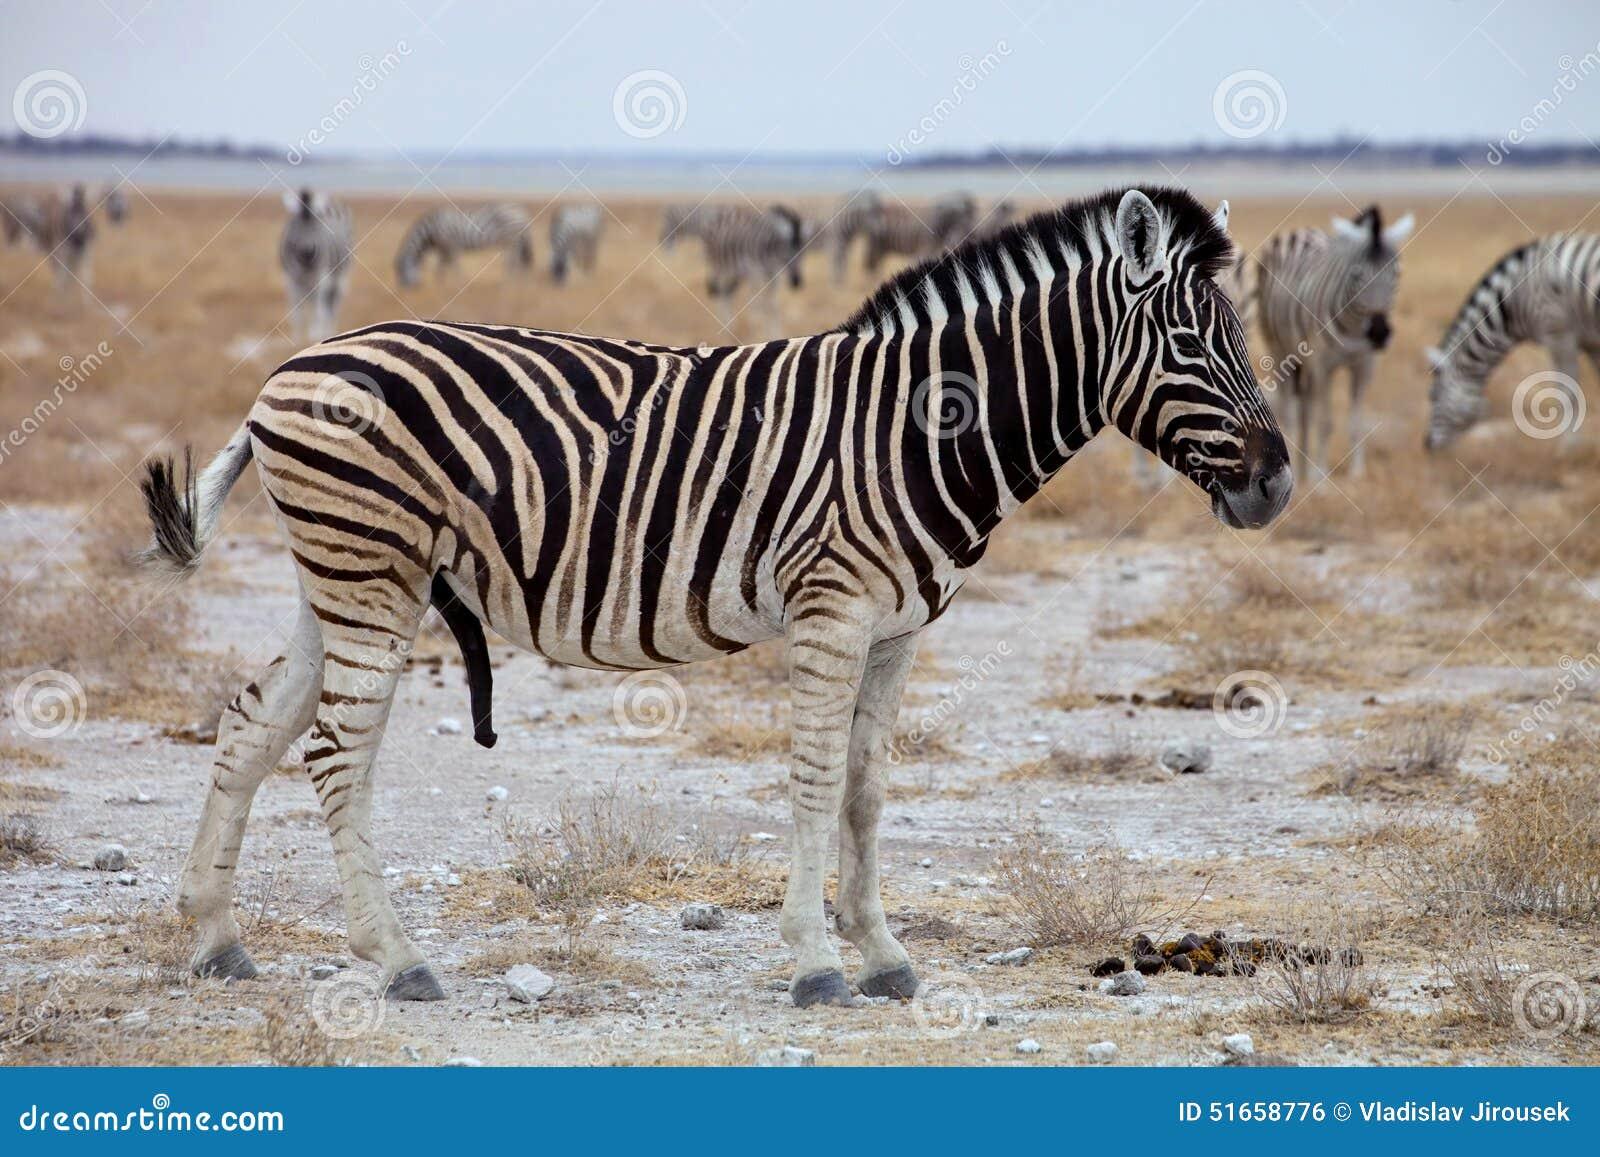 Size zebra penis Average Penis